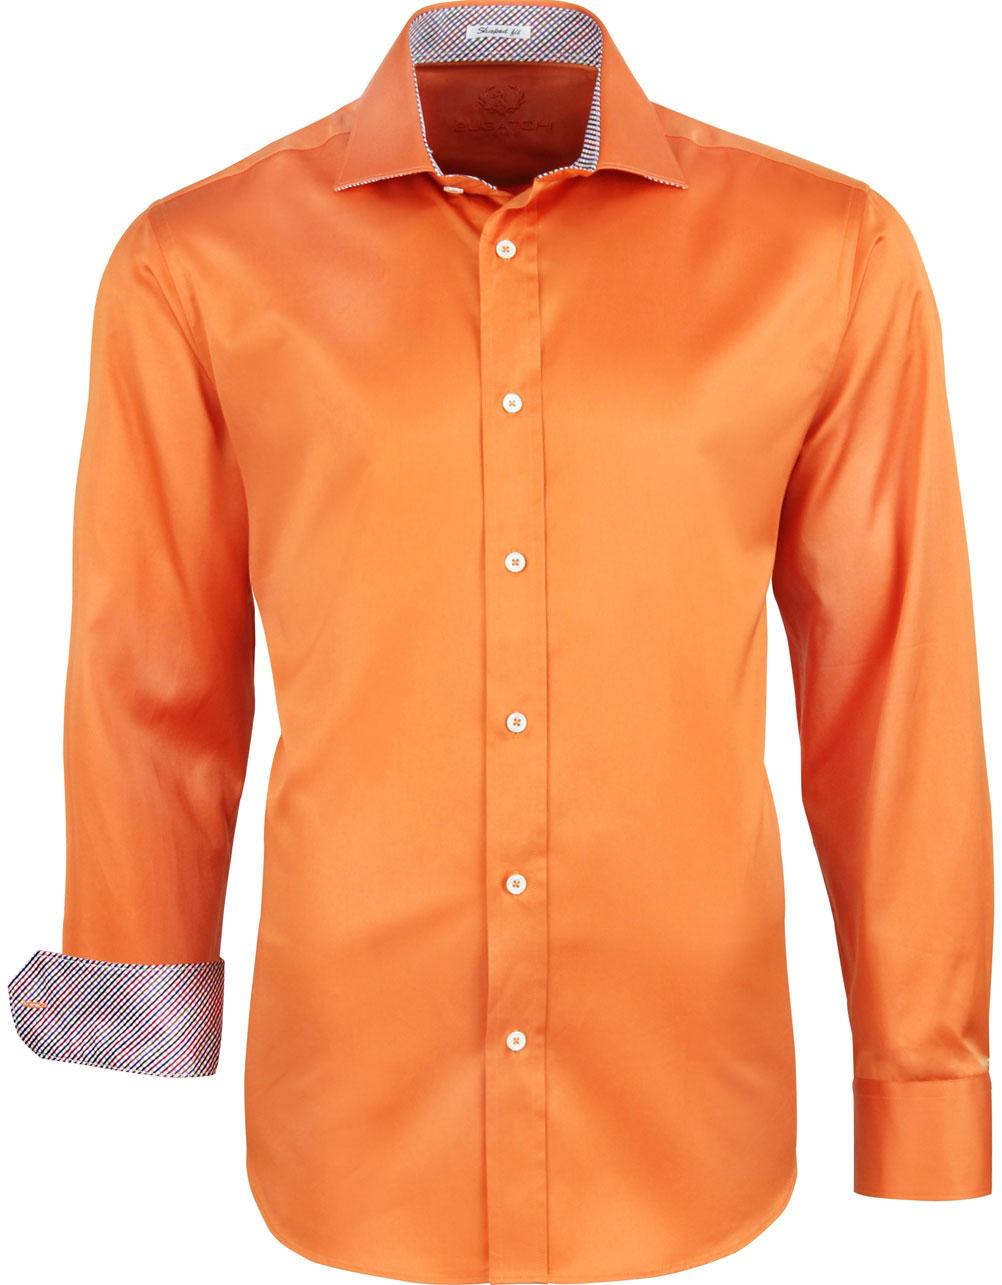 bugatchi shirts 2001 - 2017 island trends. lnjincy